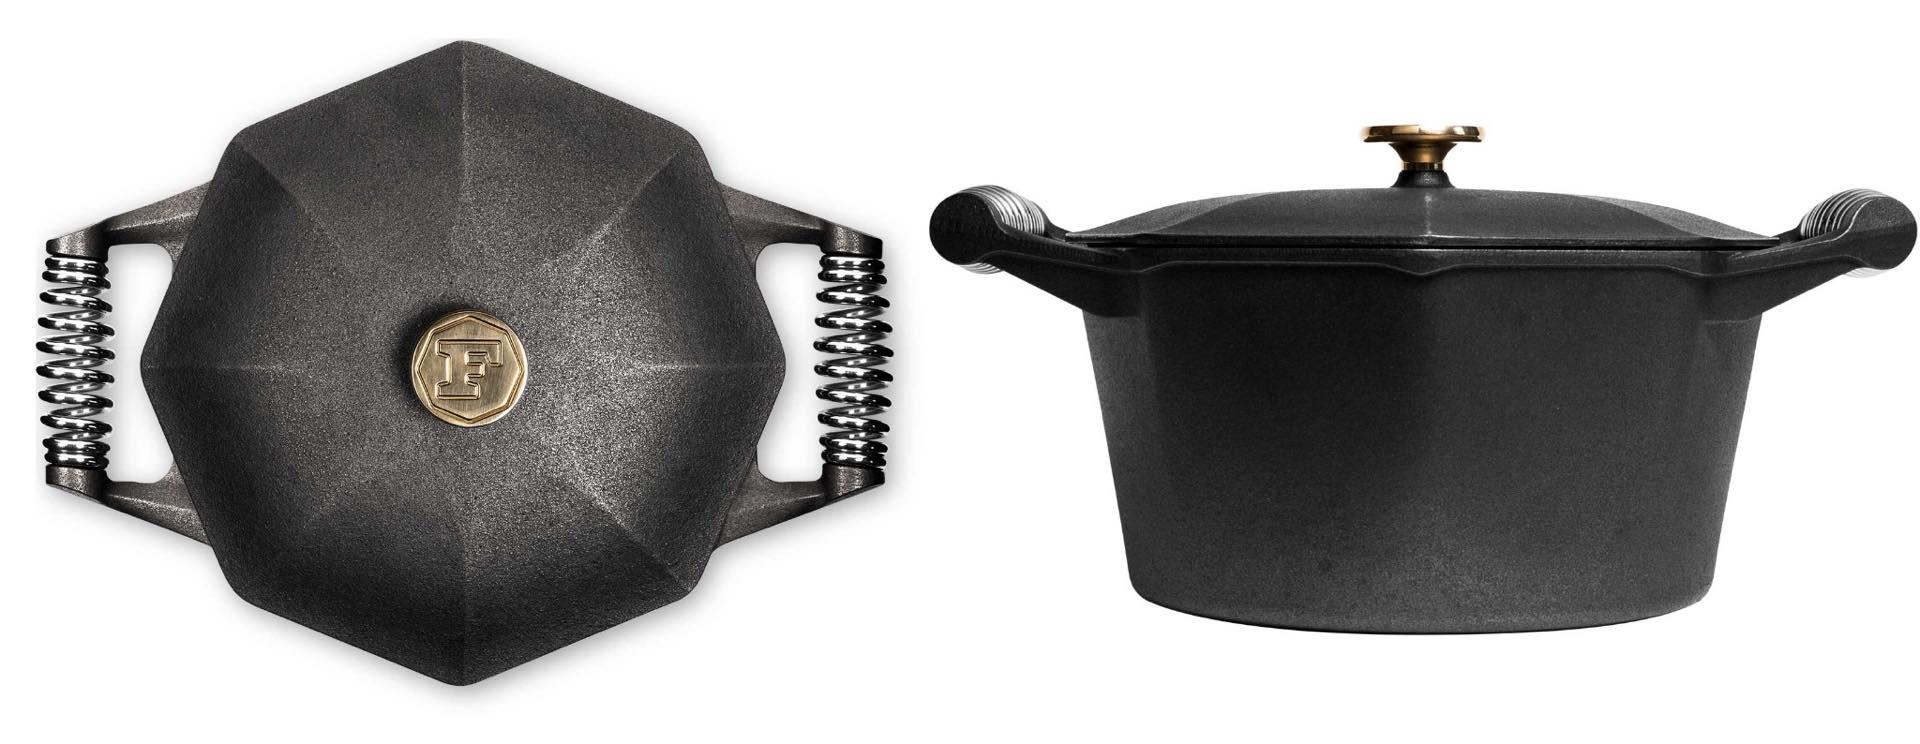 finex-cast-iron-dutch-oven